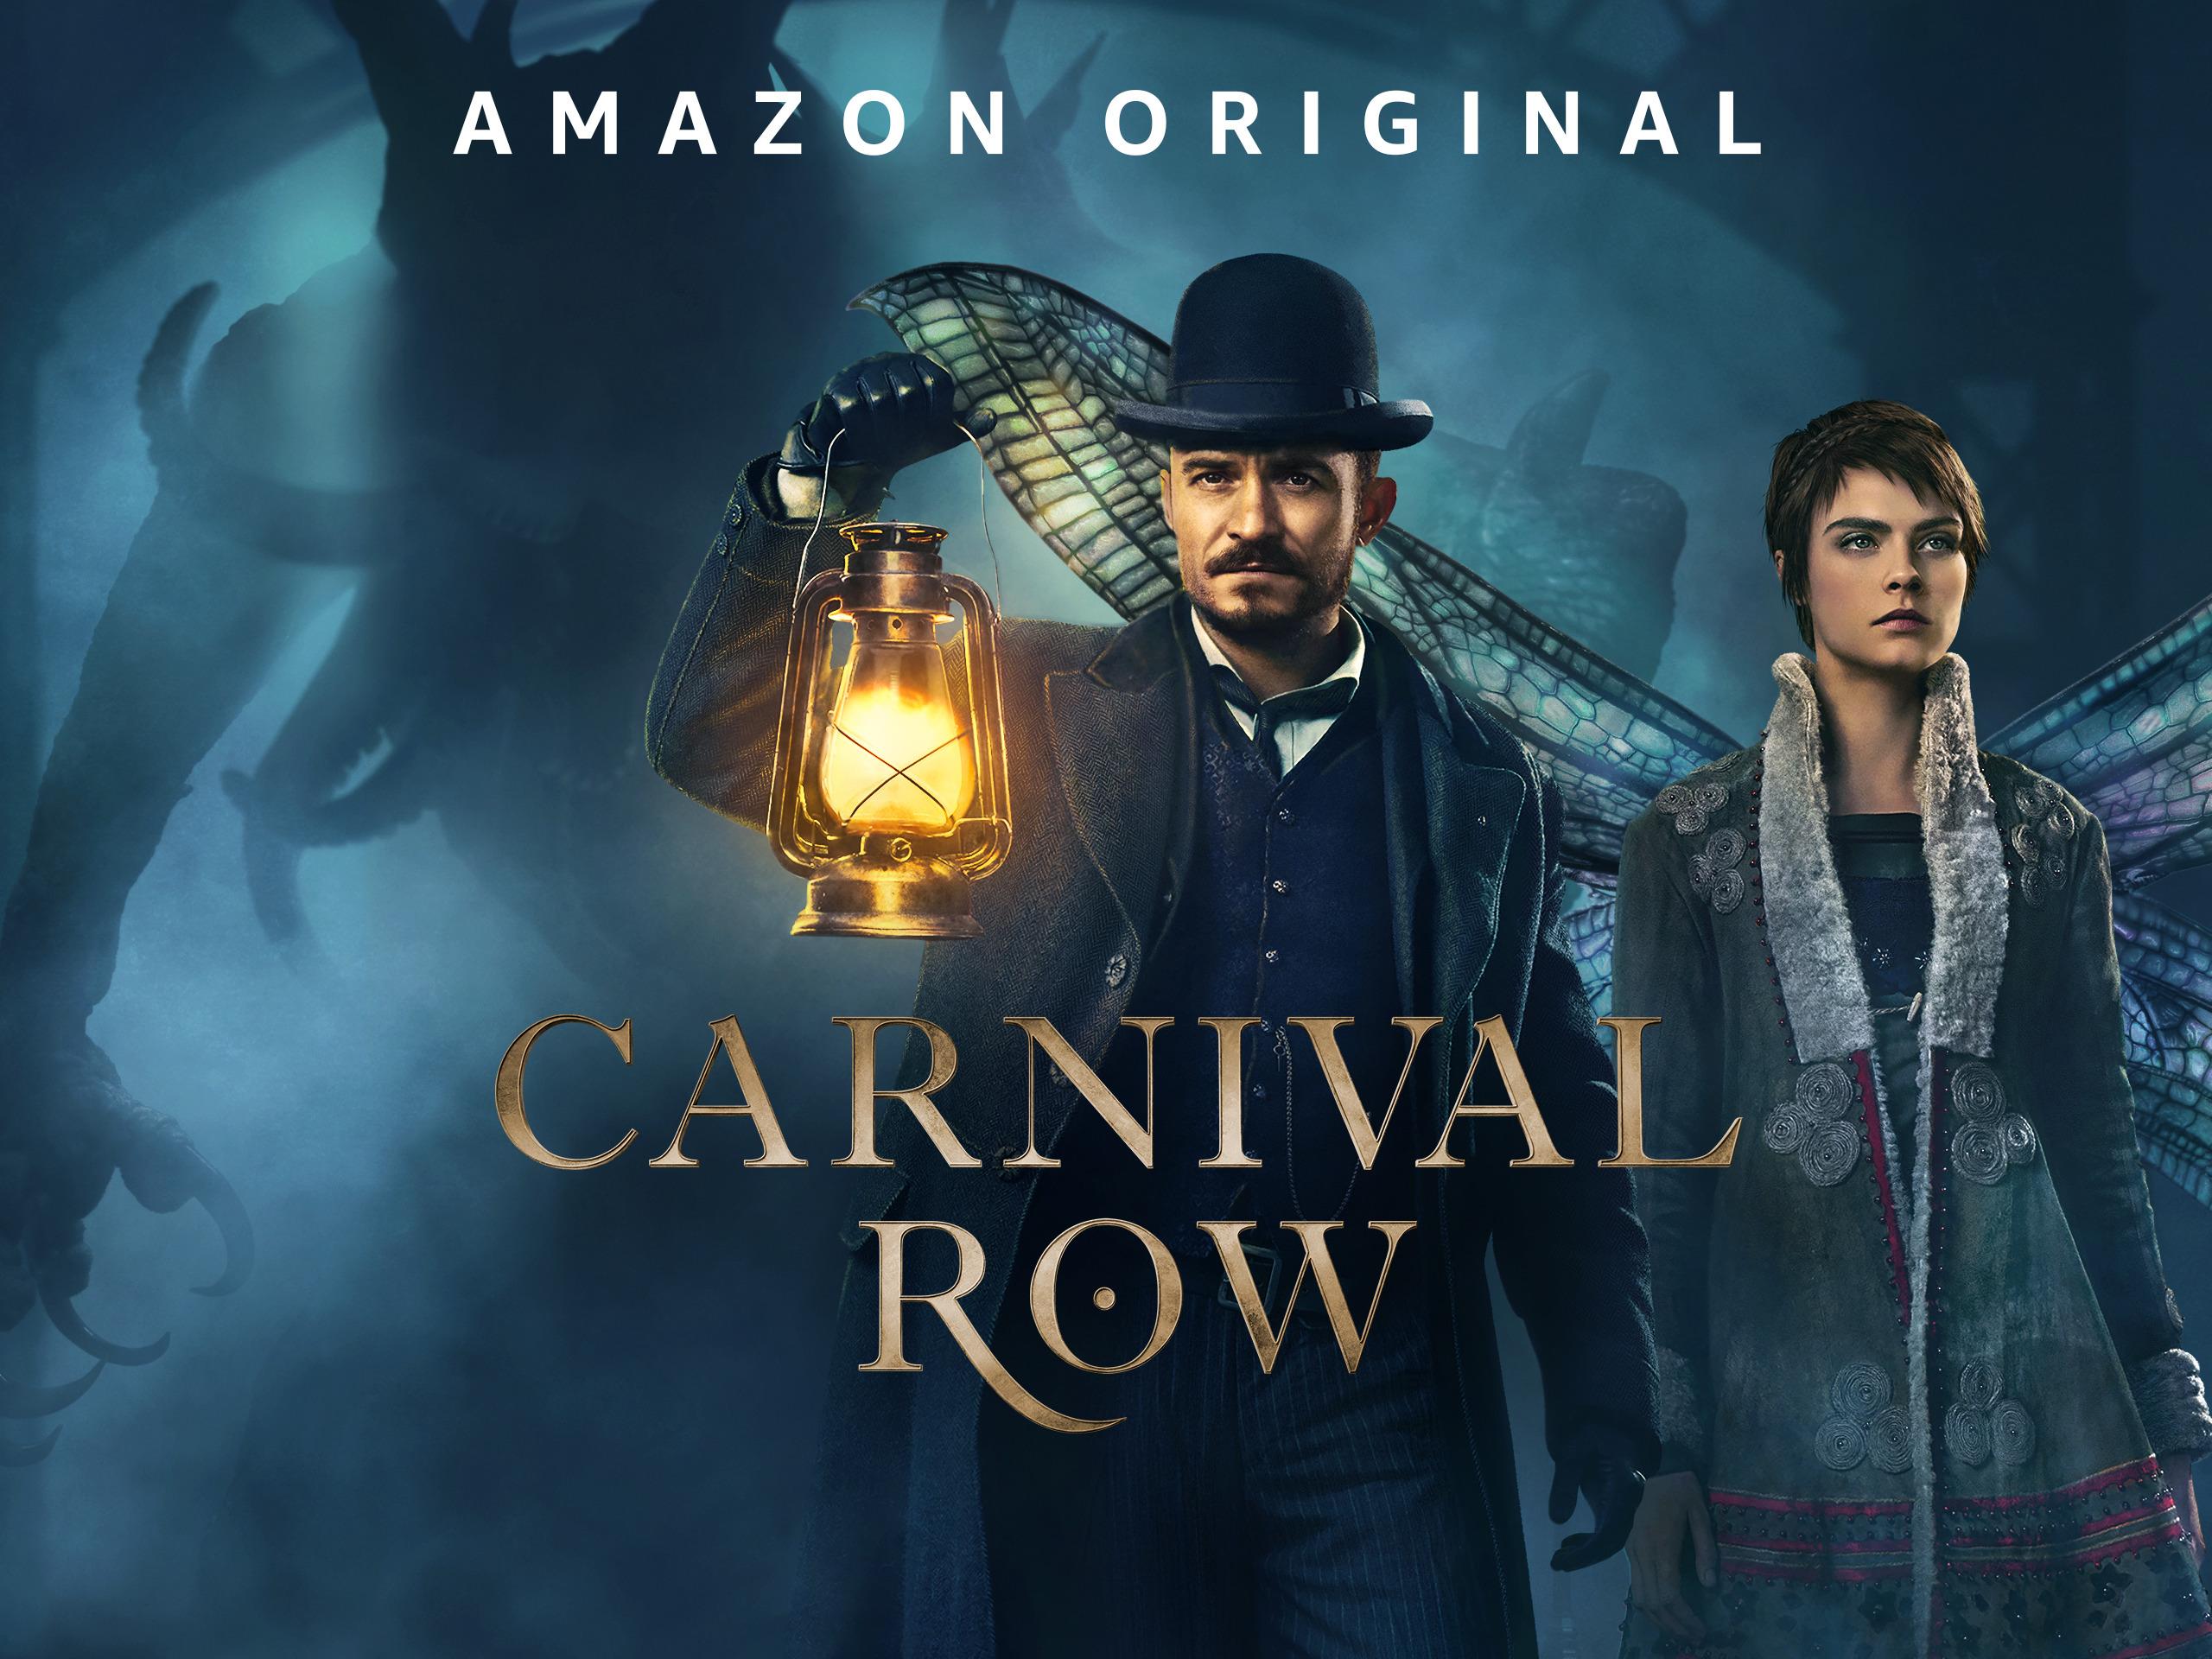 Carnival Row season 2